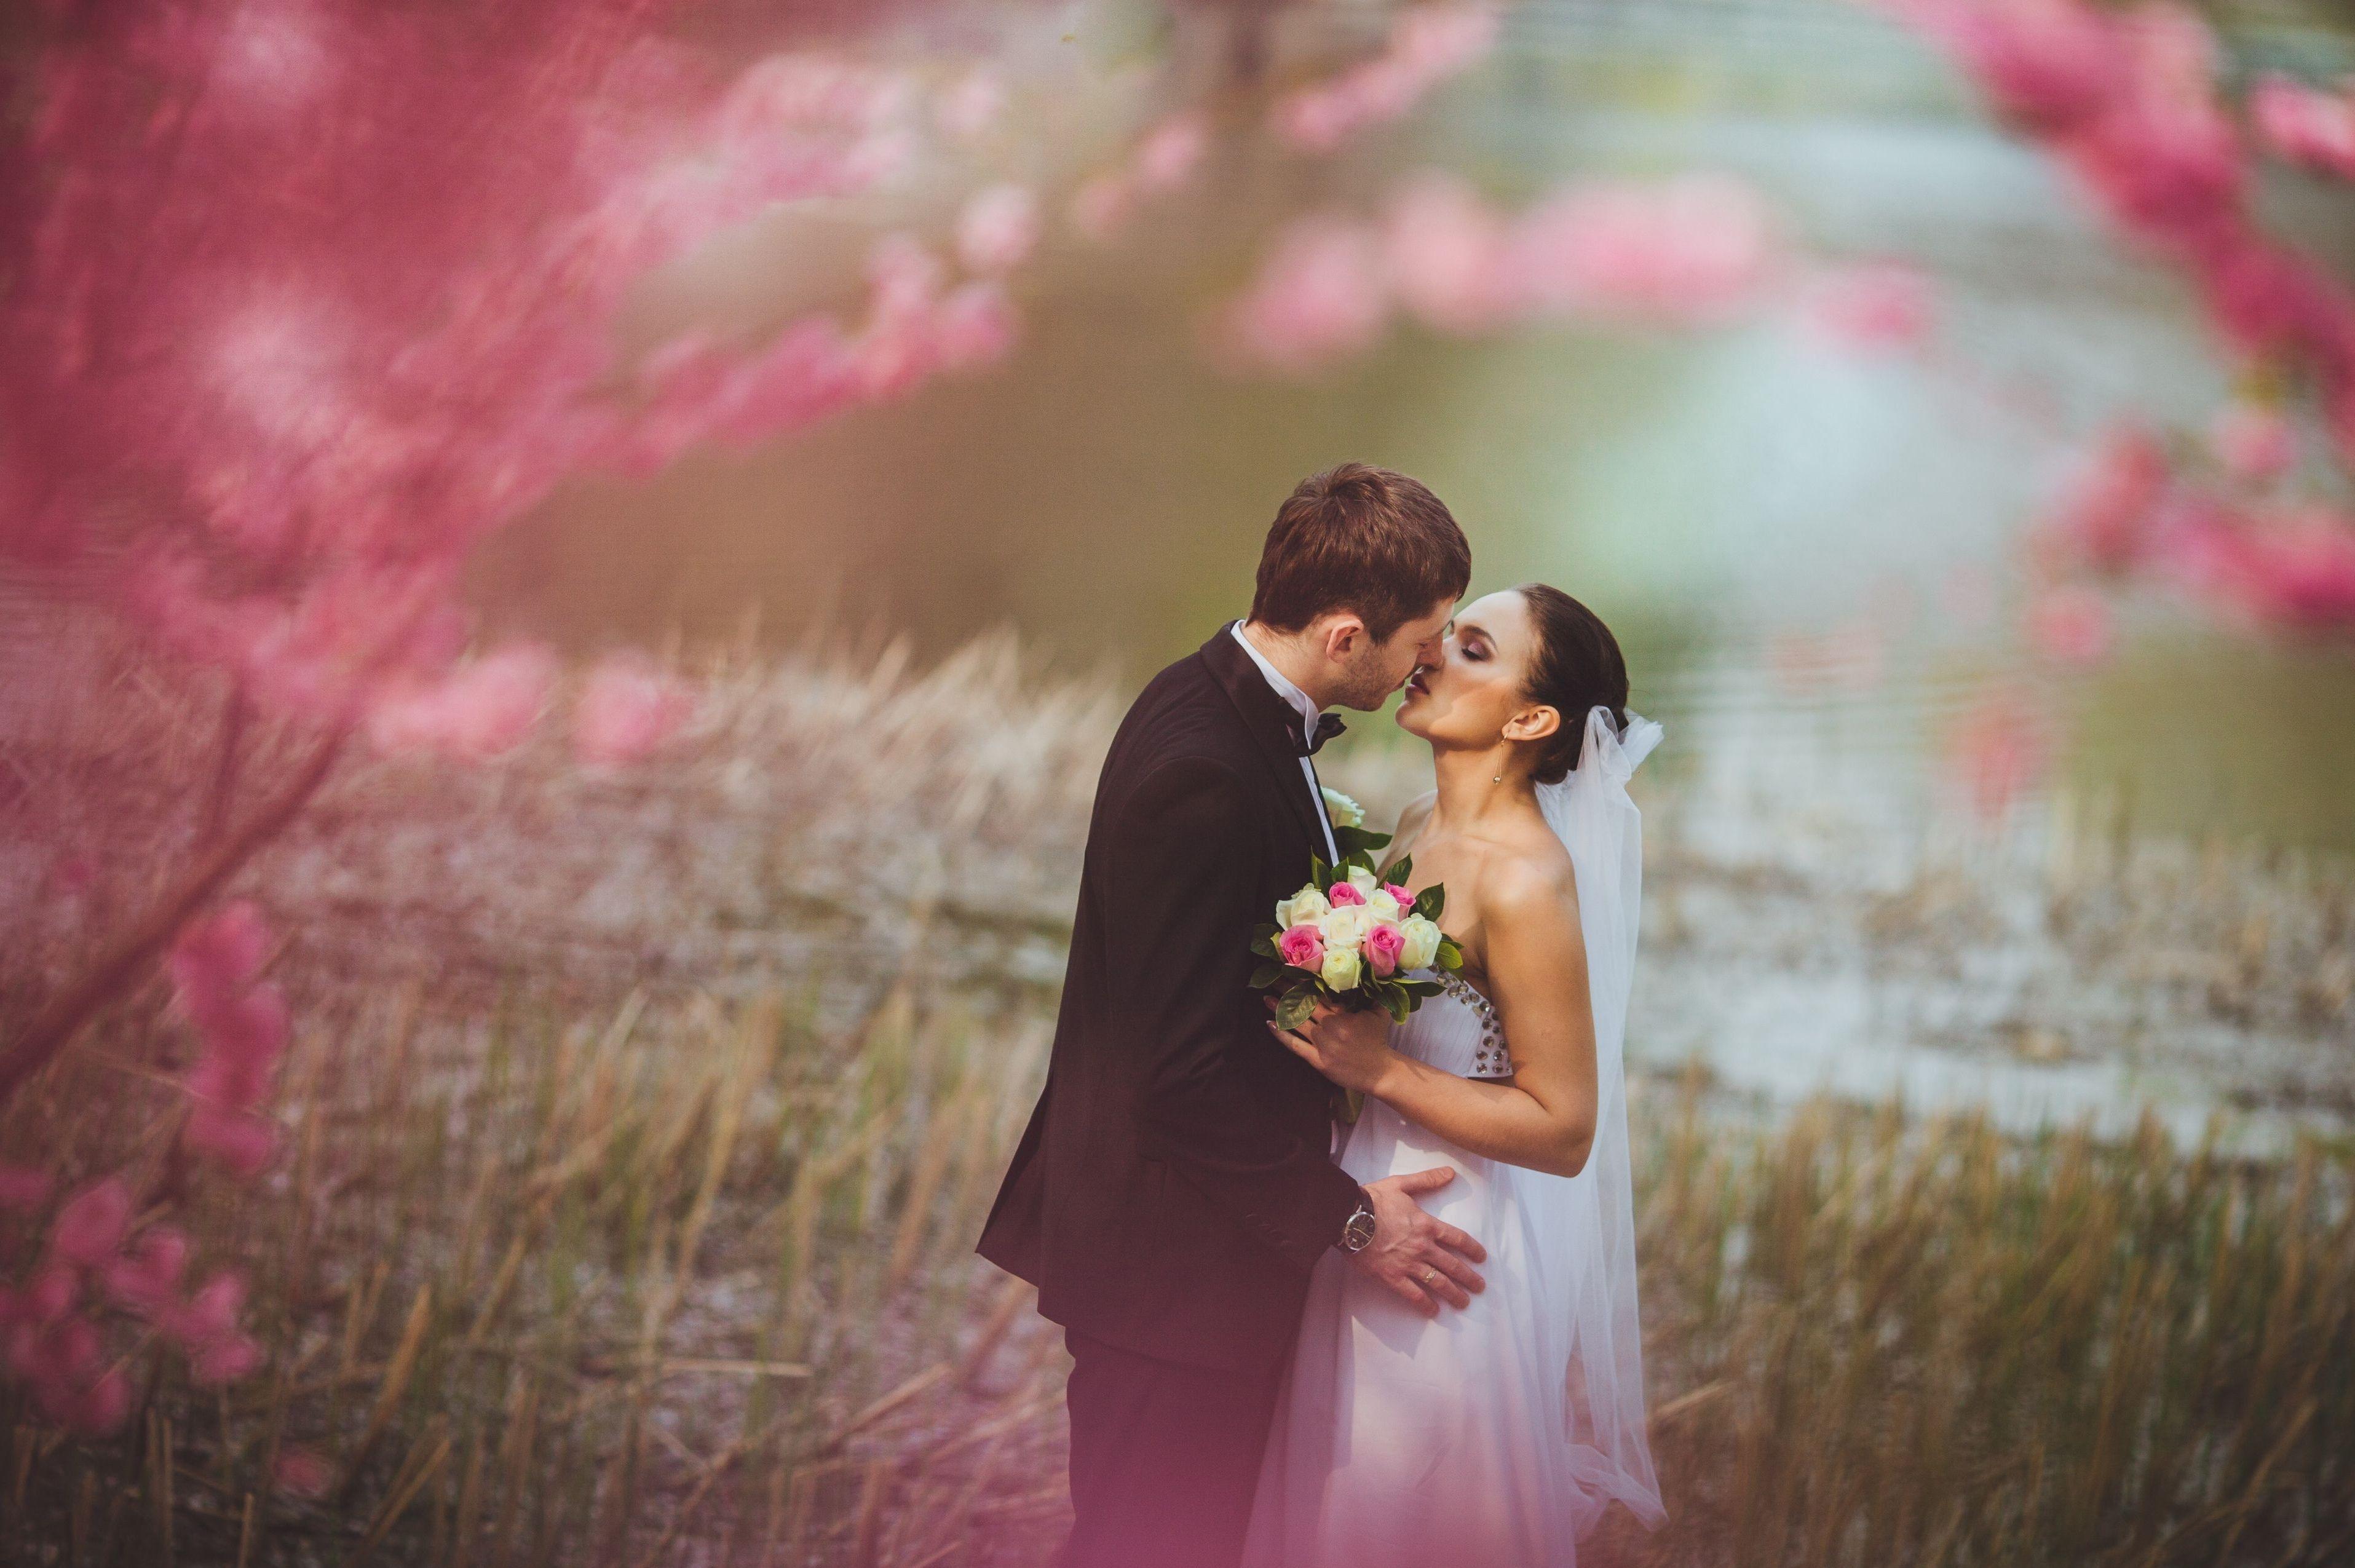 Wallpaper 3830x2550 Px Bride Girl Gown Kiss Love Man Mood